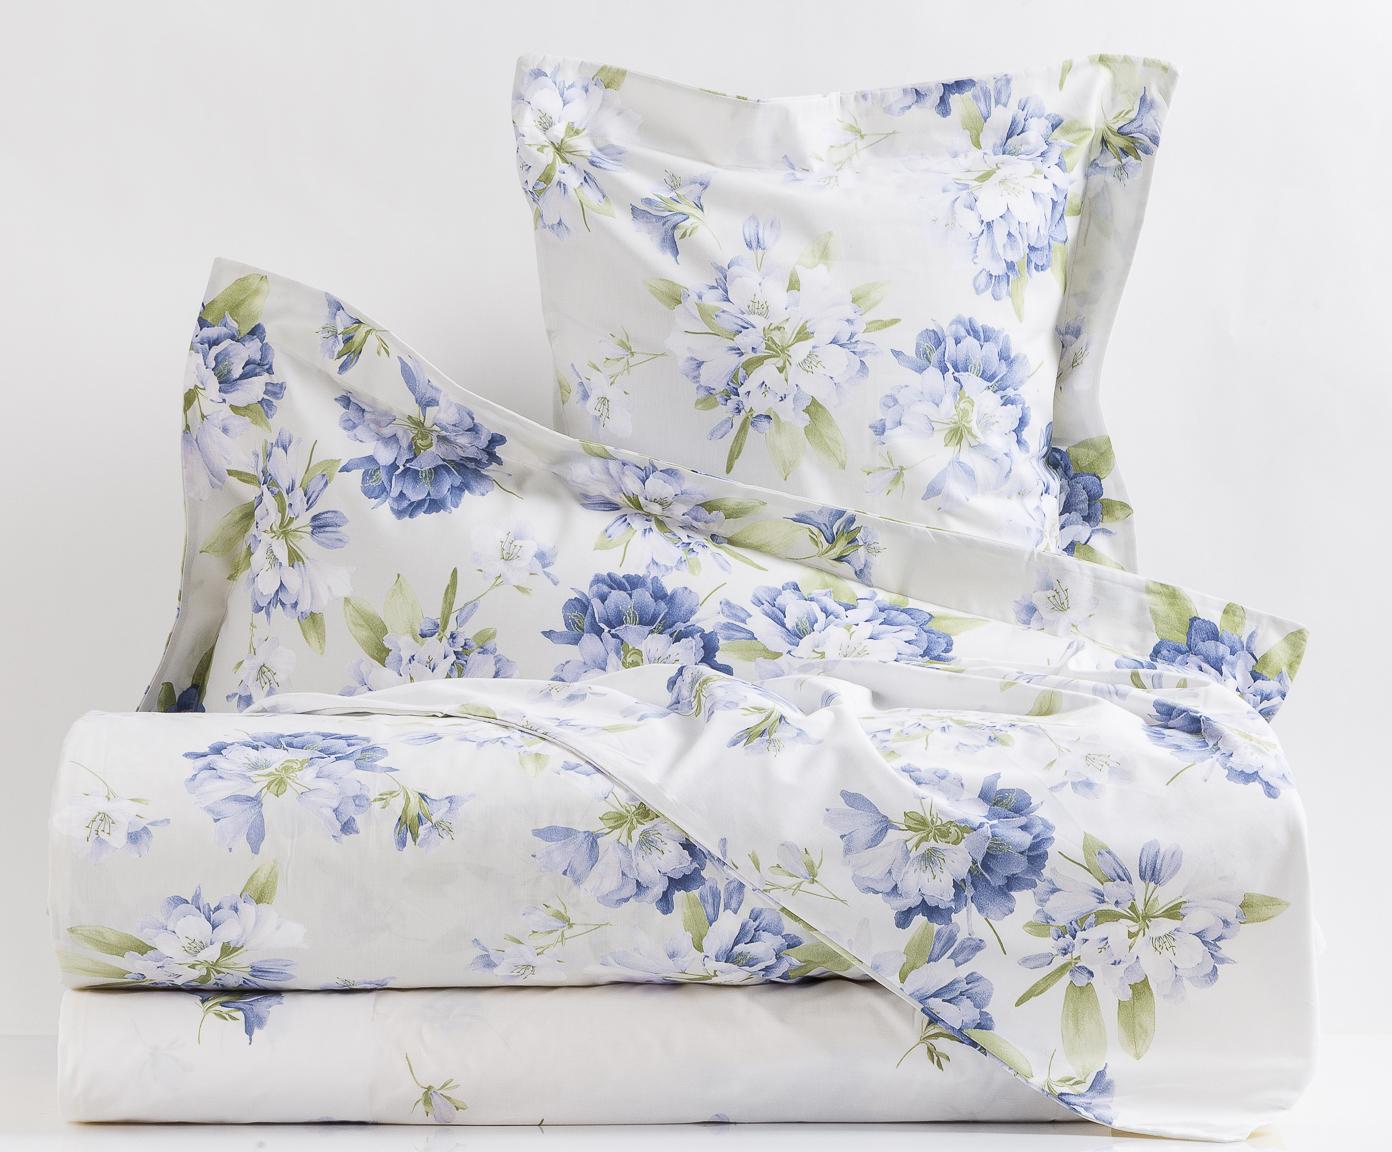 Постельное Постельное белье 2 спальное евро Mirabello Rododendri с голубыми цветами elitnoe-postelnoe-belie-rododendri-s-golubymi-tsvetami-ot-mirabello.jpg